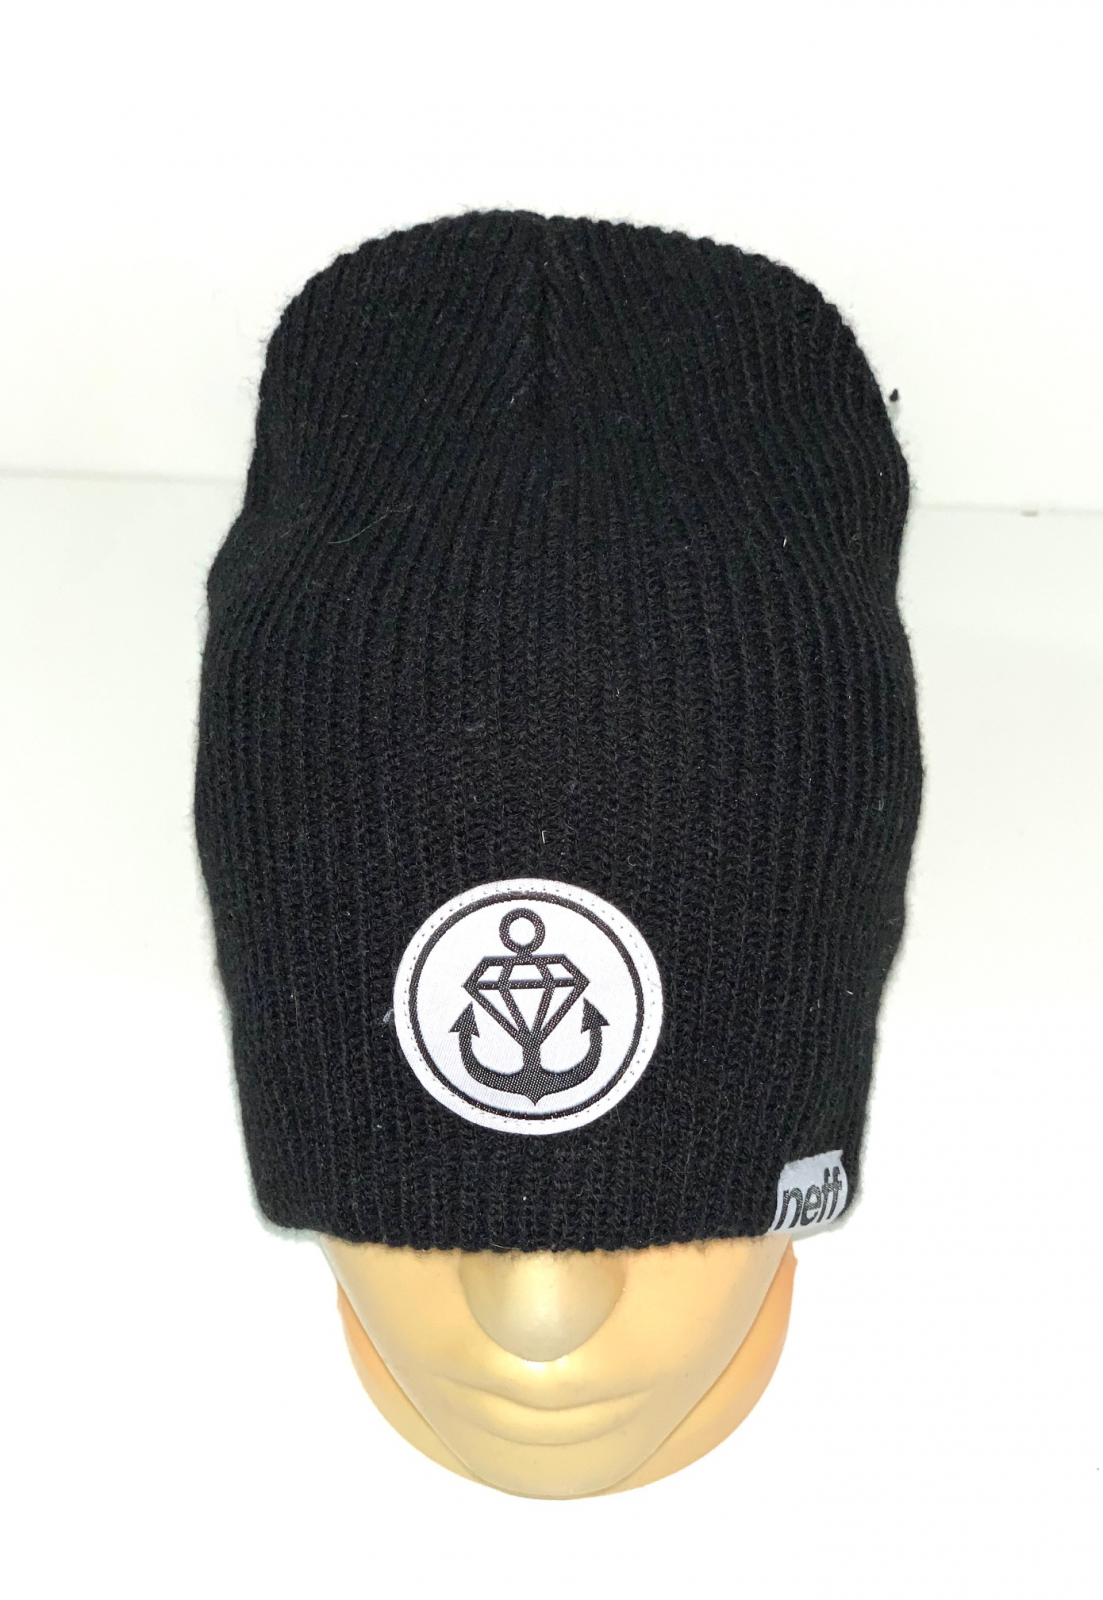 Черная шапка с якорьком